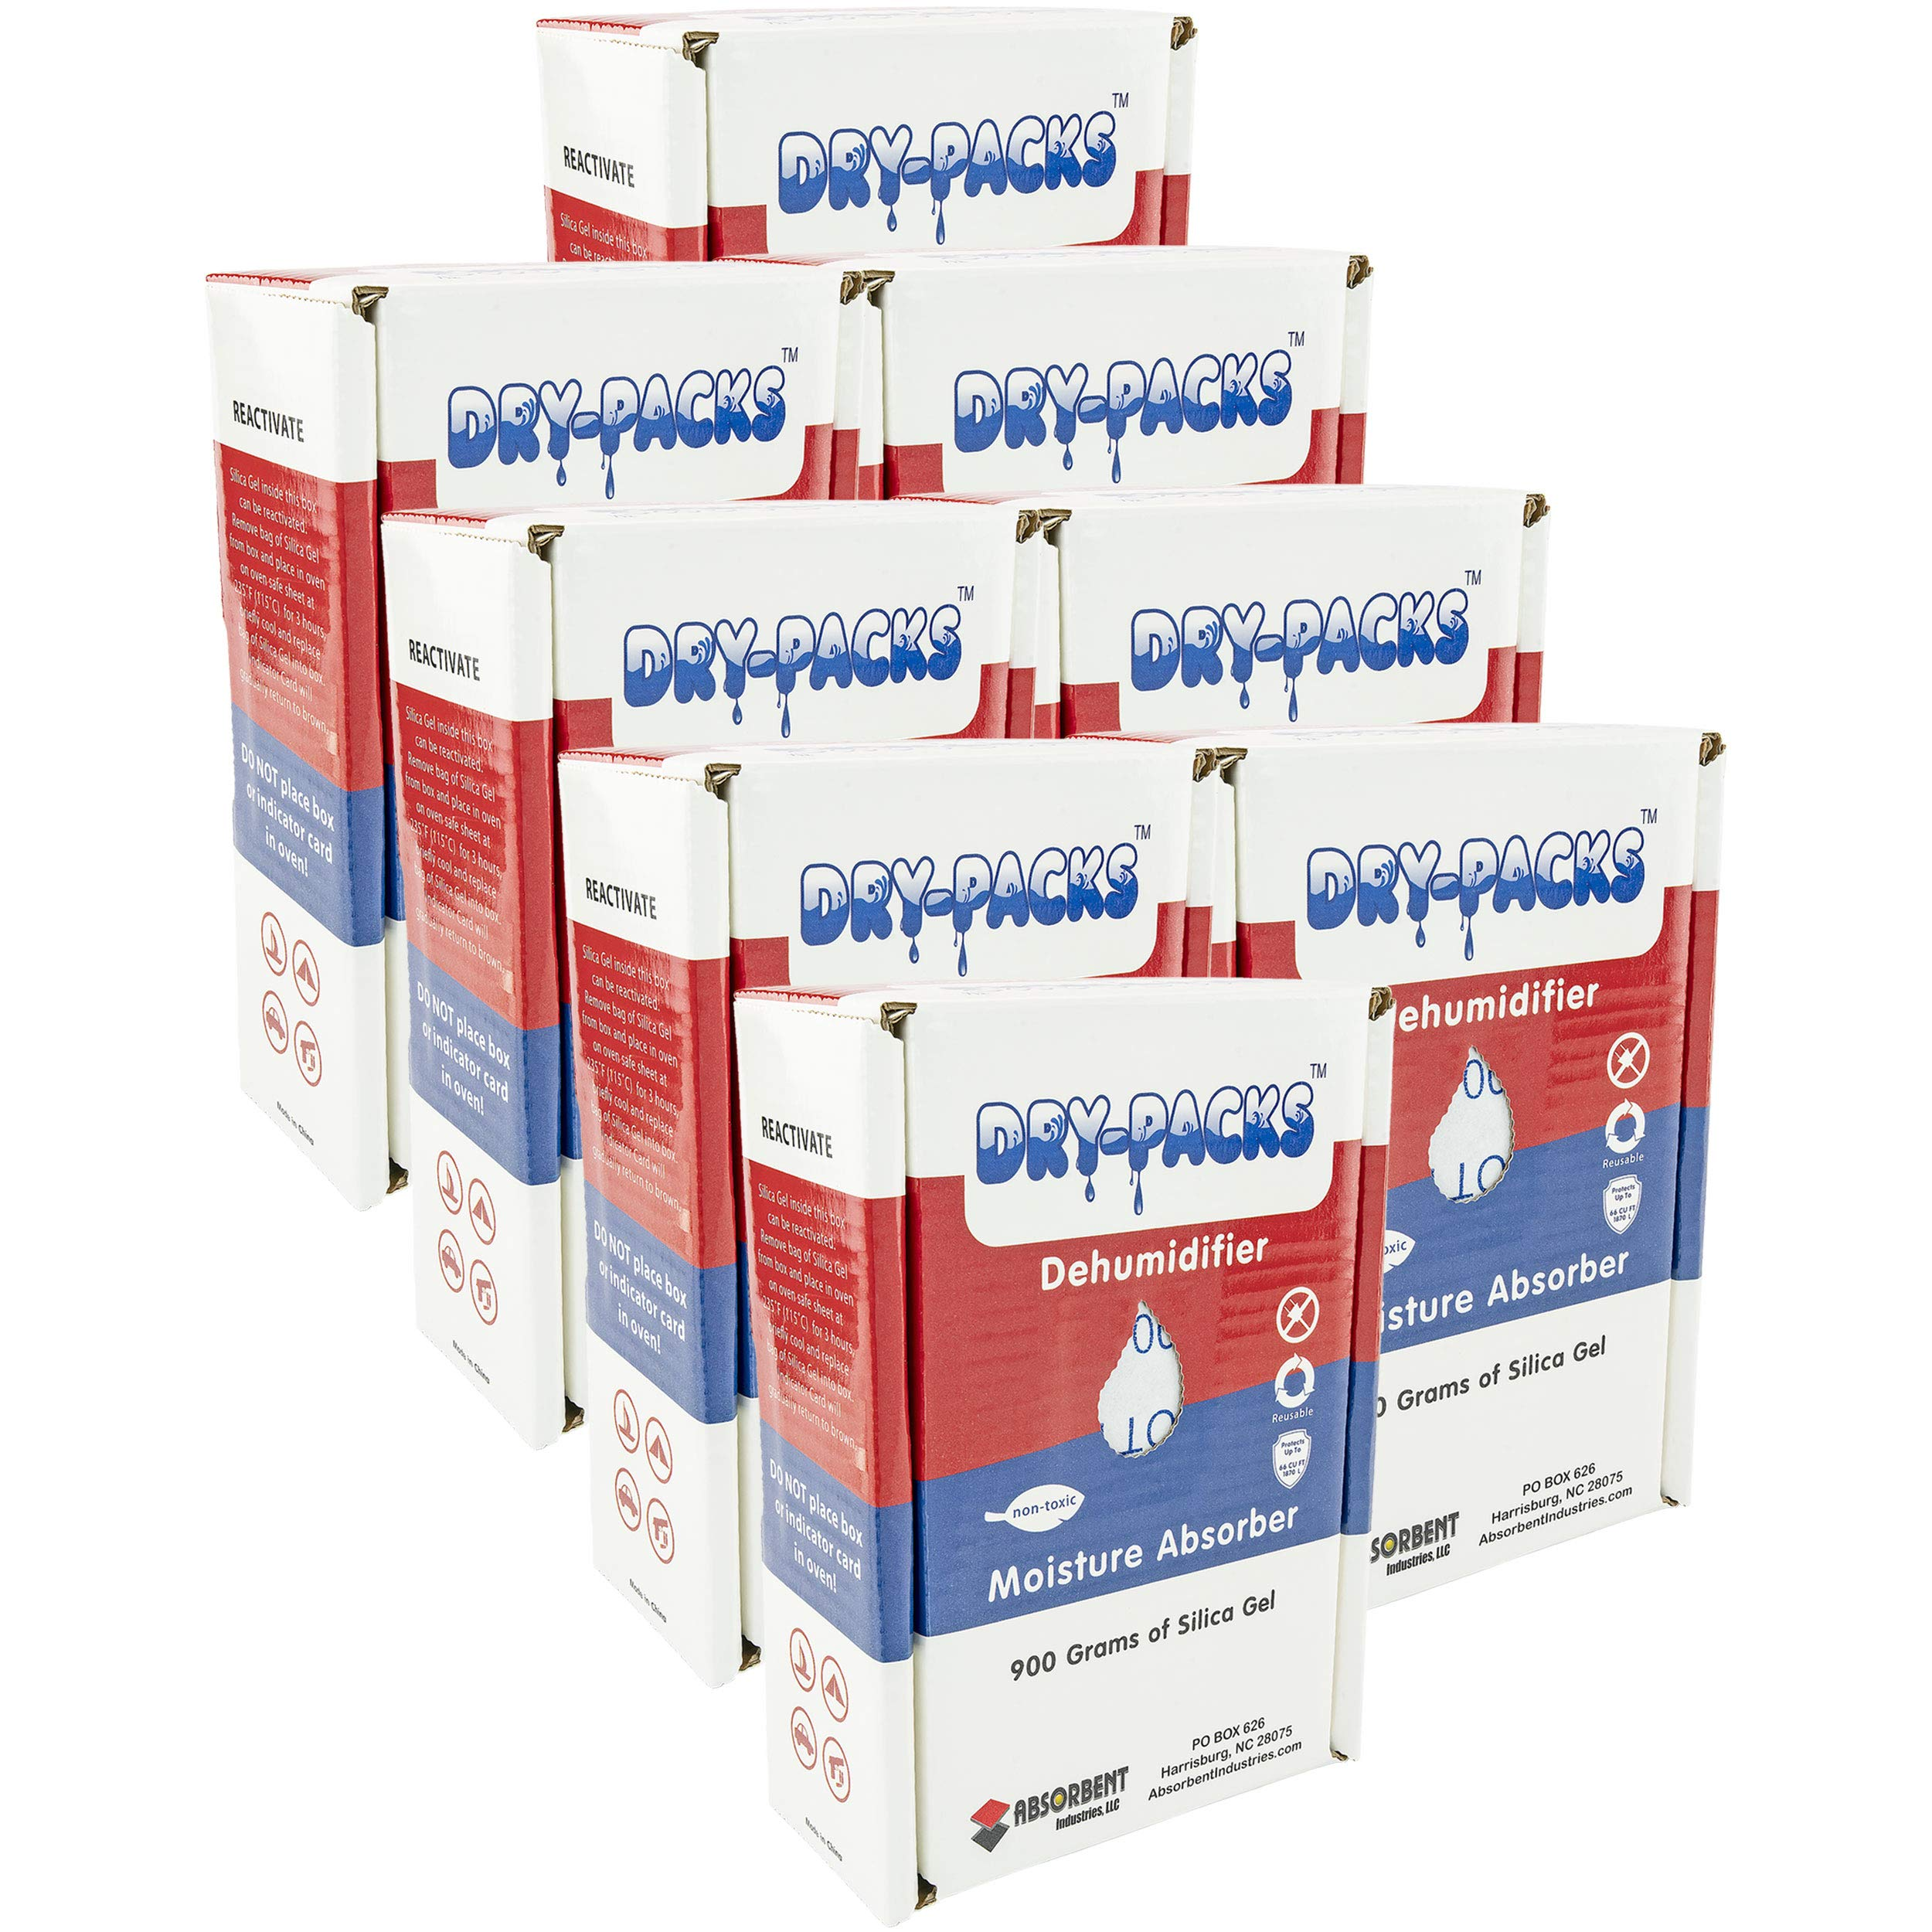 Dry-Packs DP900BOX-8pk 900gm Dehumidifying Box, Pack of 8, 8-Pack White by Dry-Packs